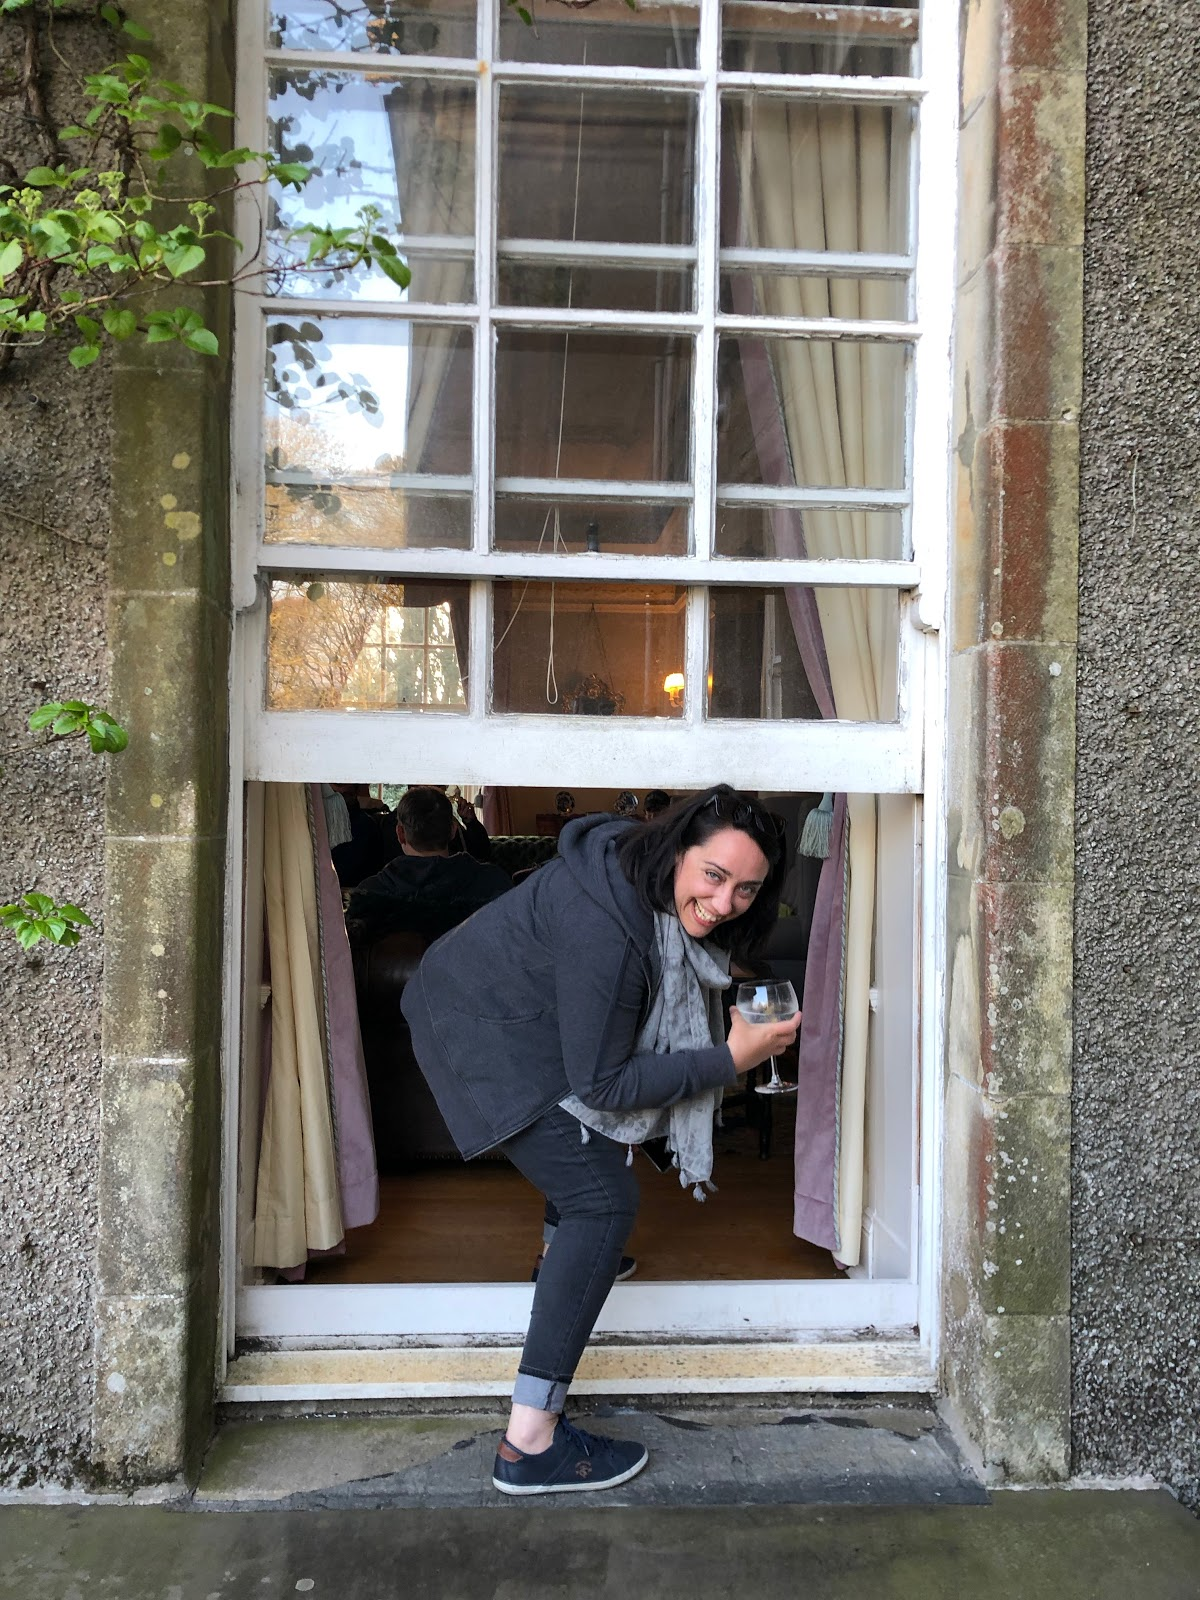 Climbing through the window